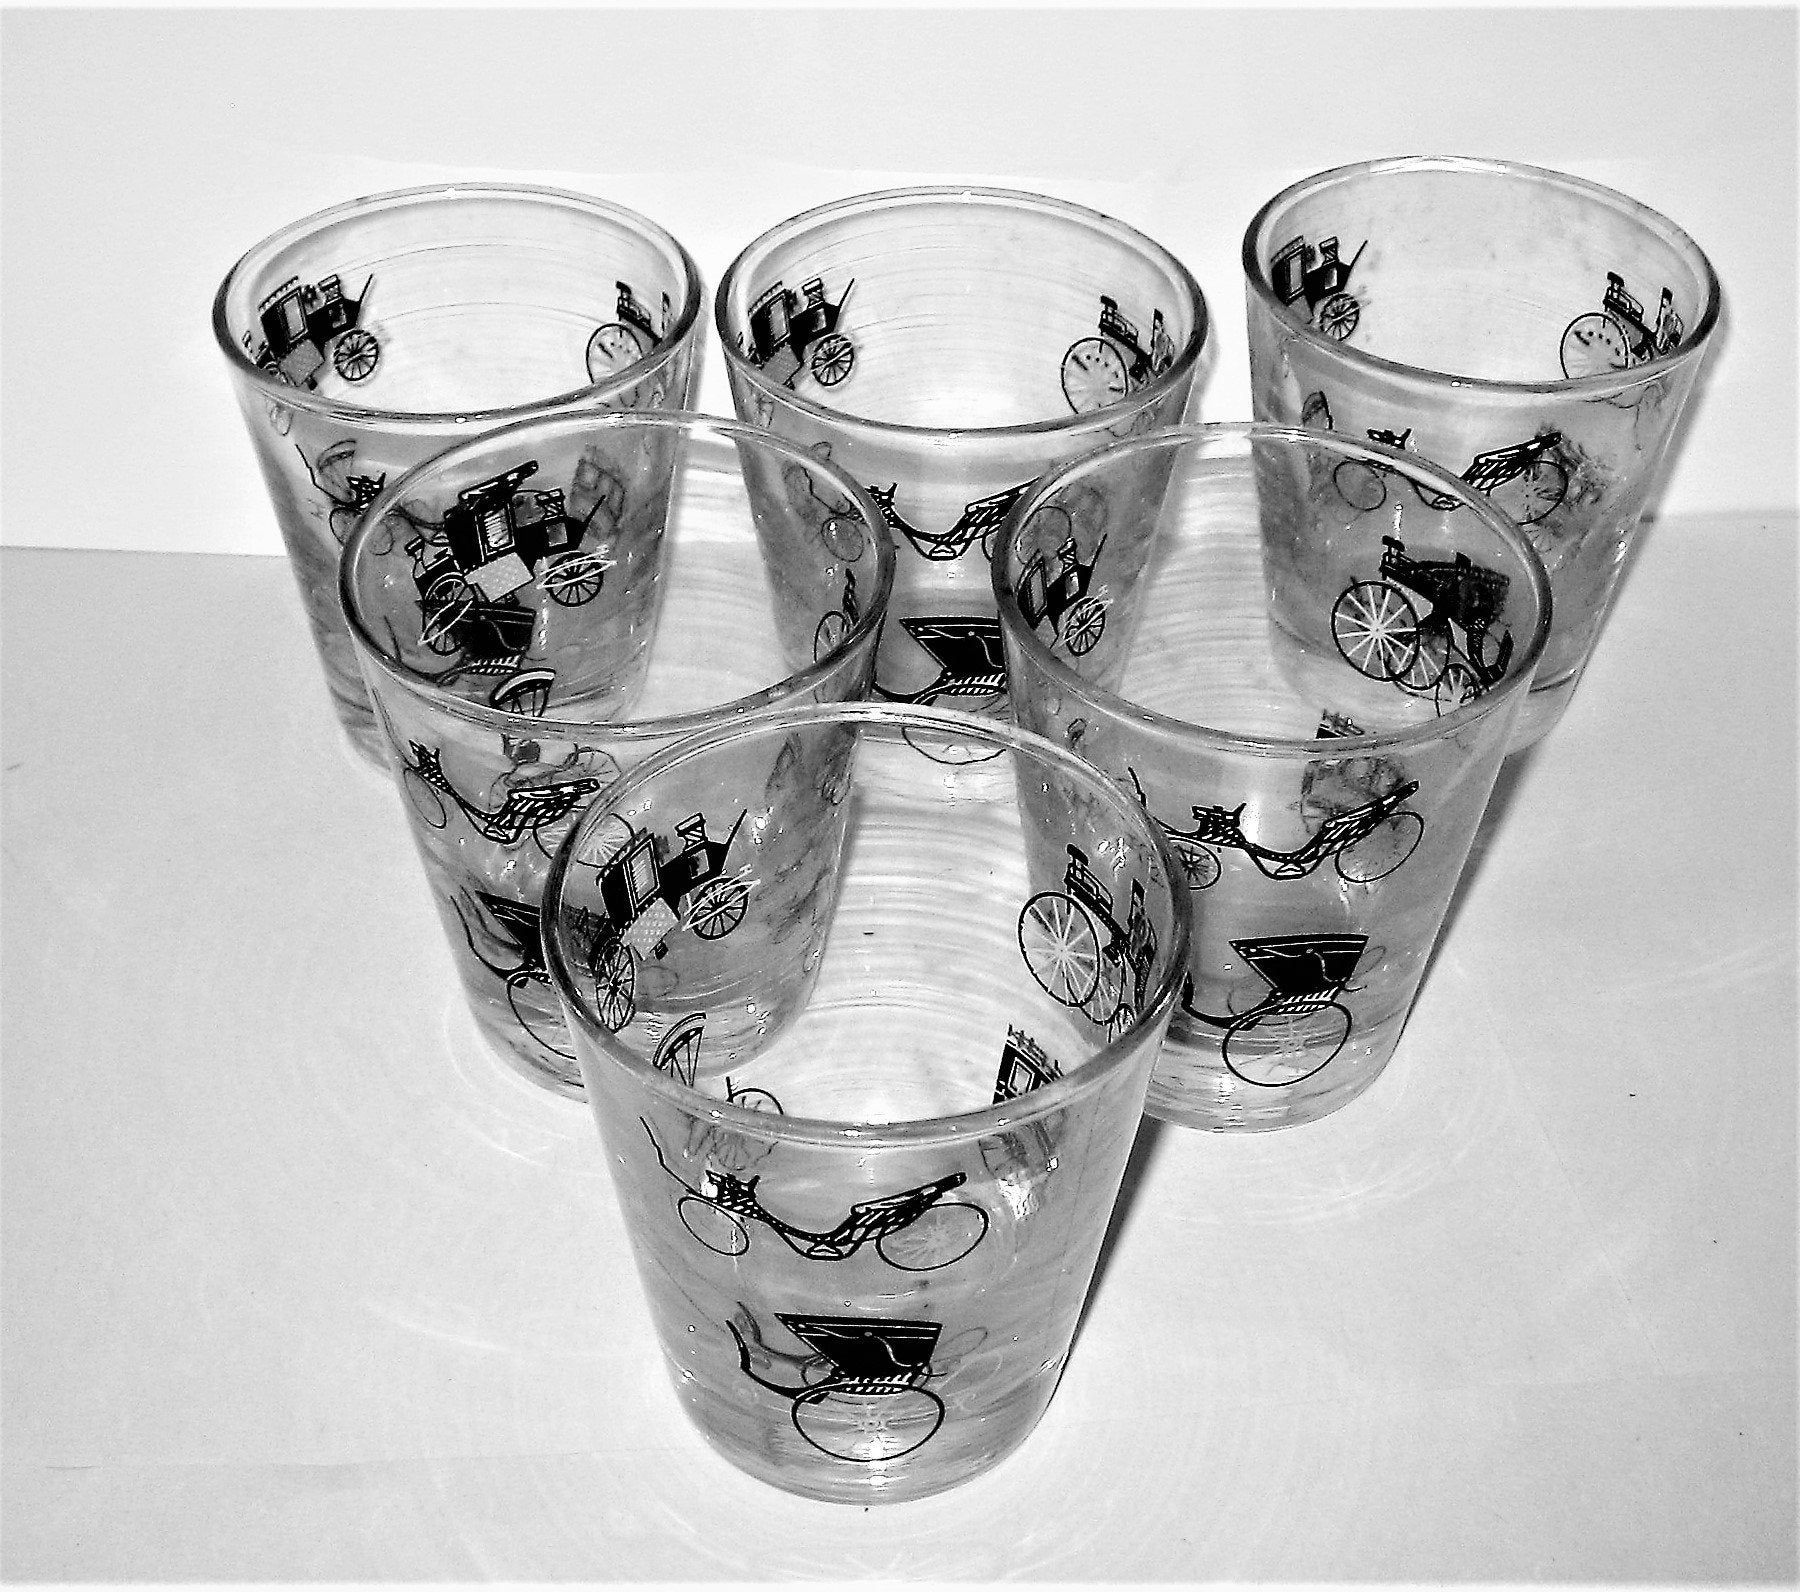 Set of 6 Vintage On The Rocks Glasses, Whiskey Glasses